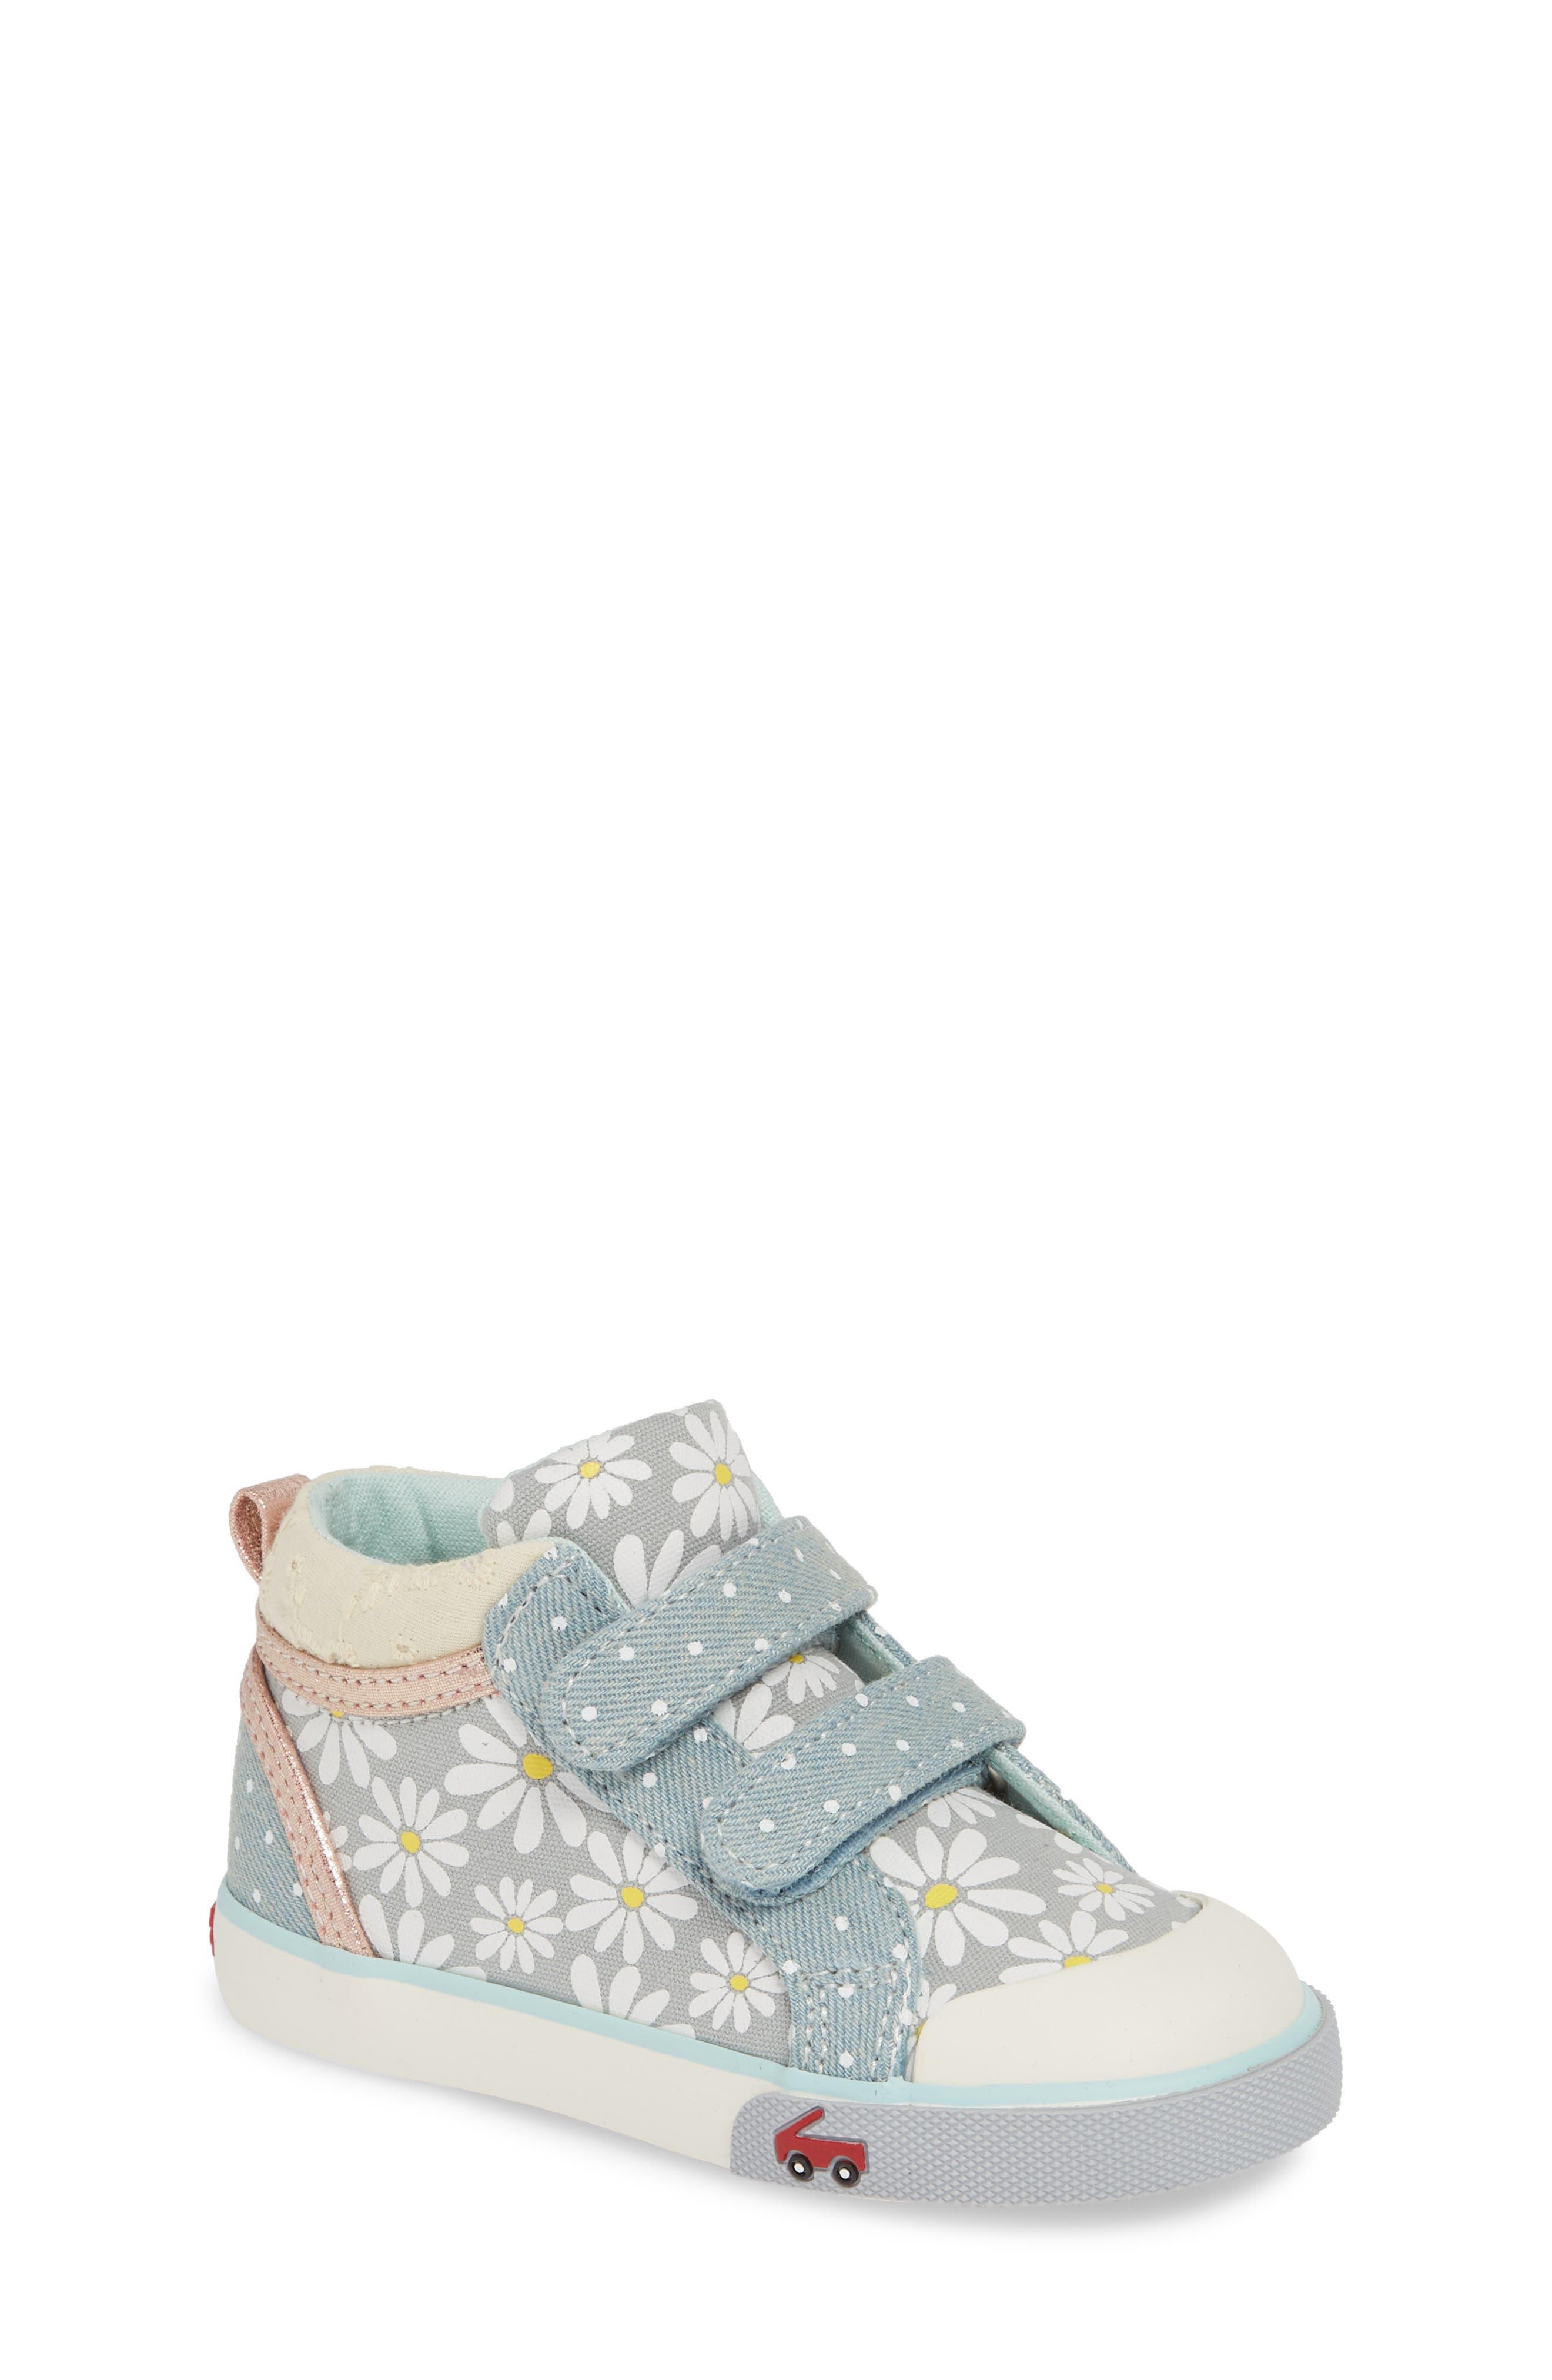 SEE KAI RUN, Kya Sneaker, Main thumbnail 1, color, GRAY DAISY